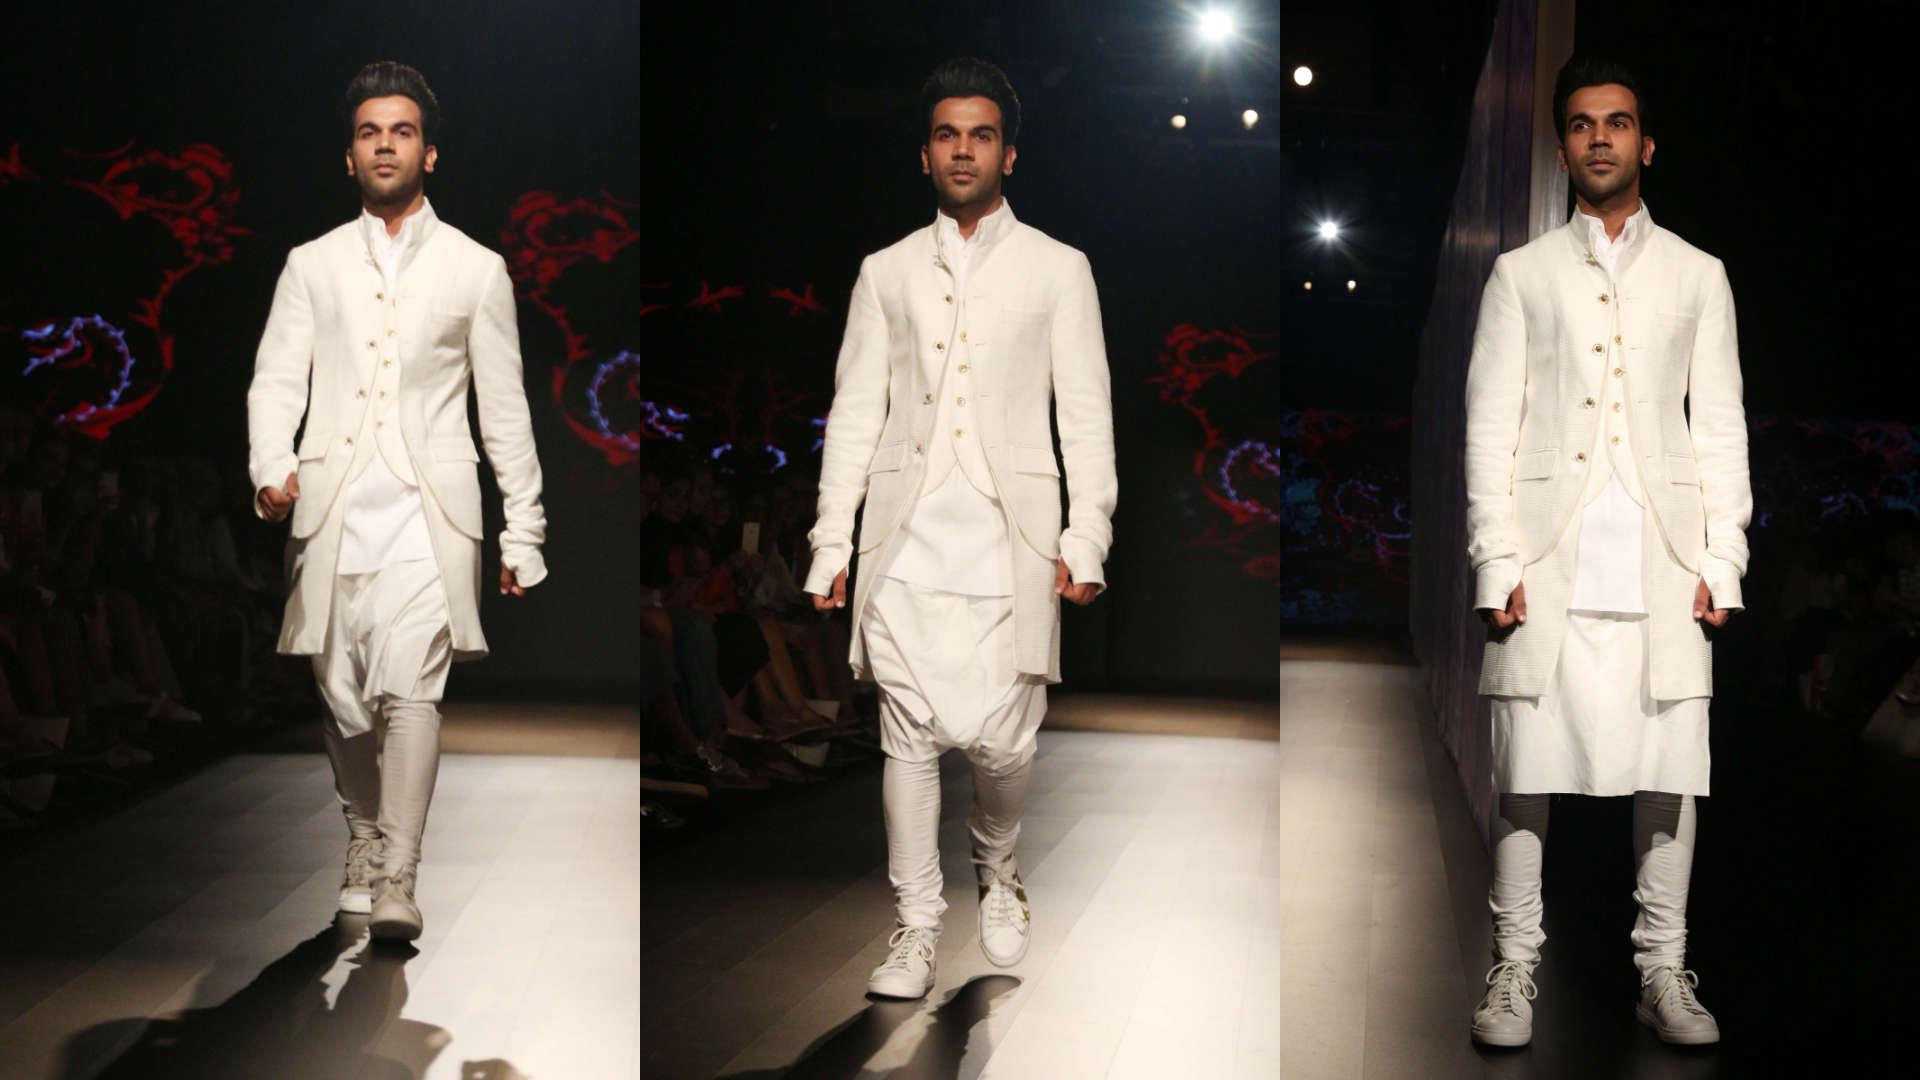 79a7f73571cb23 Lakme Fashion Week Day 2: Rajkummar Rao turns showstopper for Rajesh Pratap  Singh, Watch Videos Online | MissKyra Videos